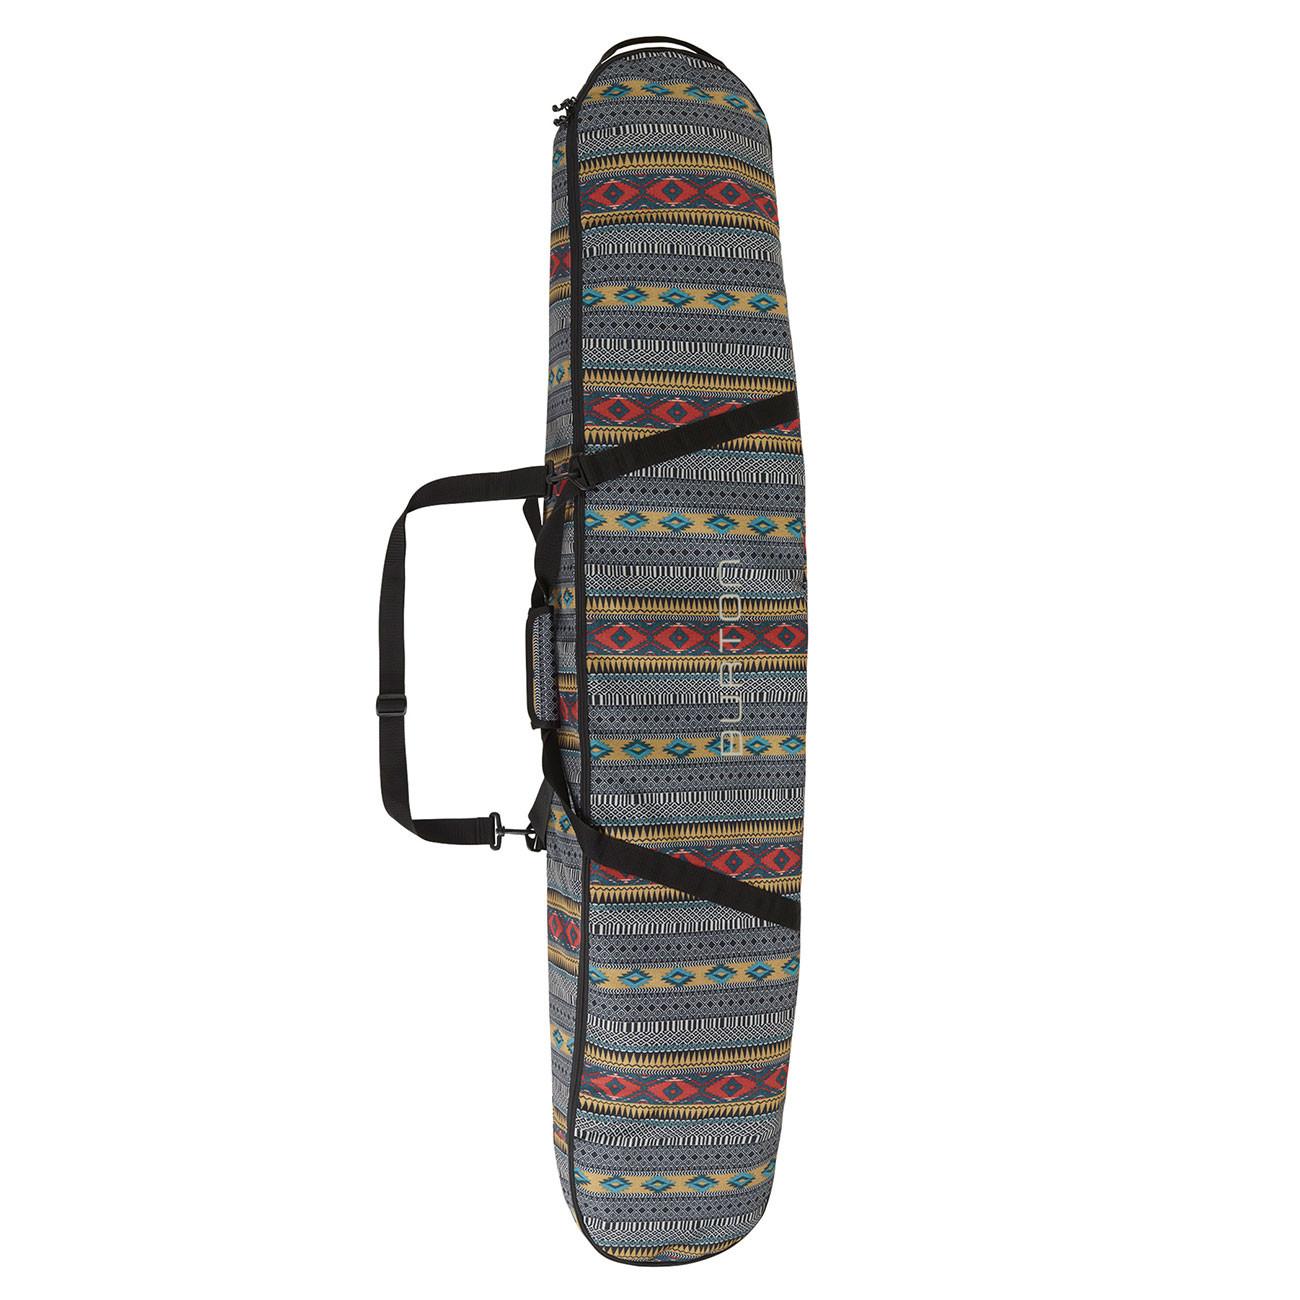 c1b0076f53 Obal na snowboard Burton Space Sack tahoe freya weave